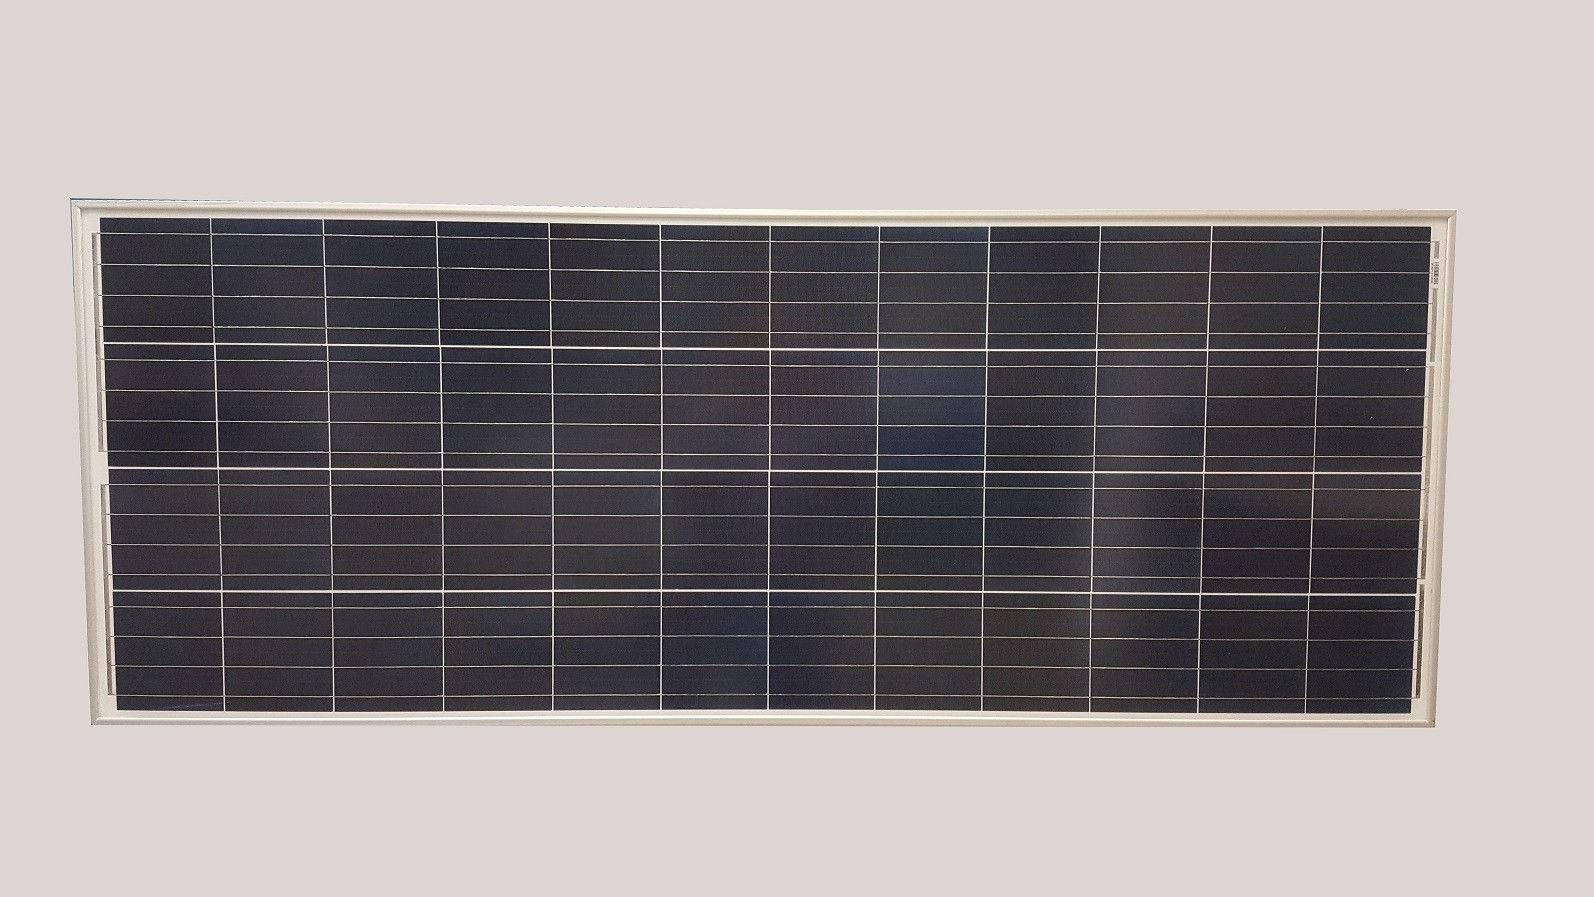 Panel Solar 48 células 180W ERA ESPMC Policristalino